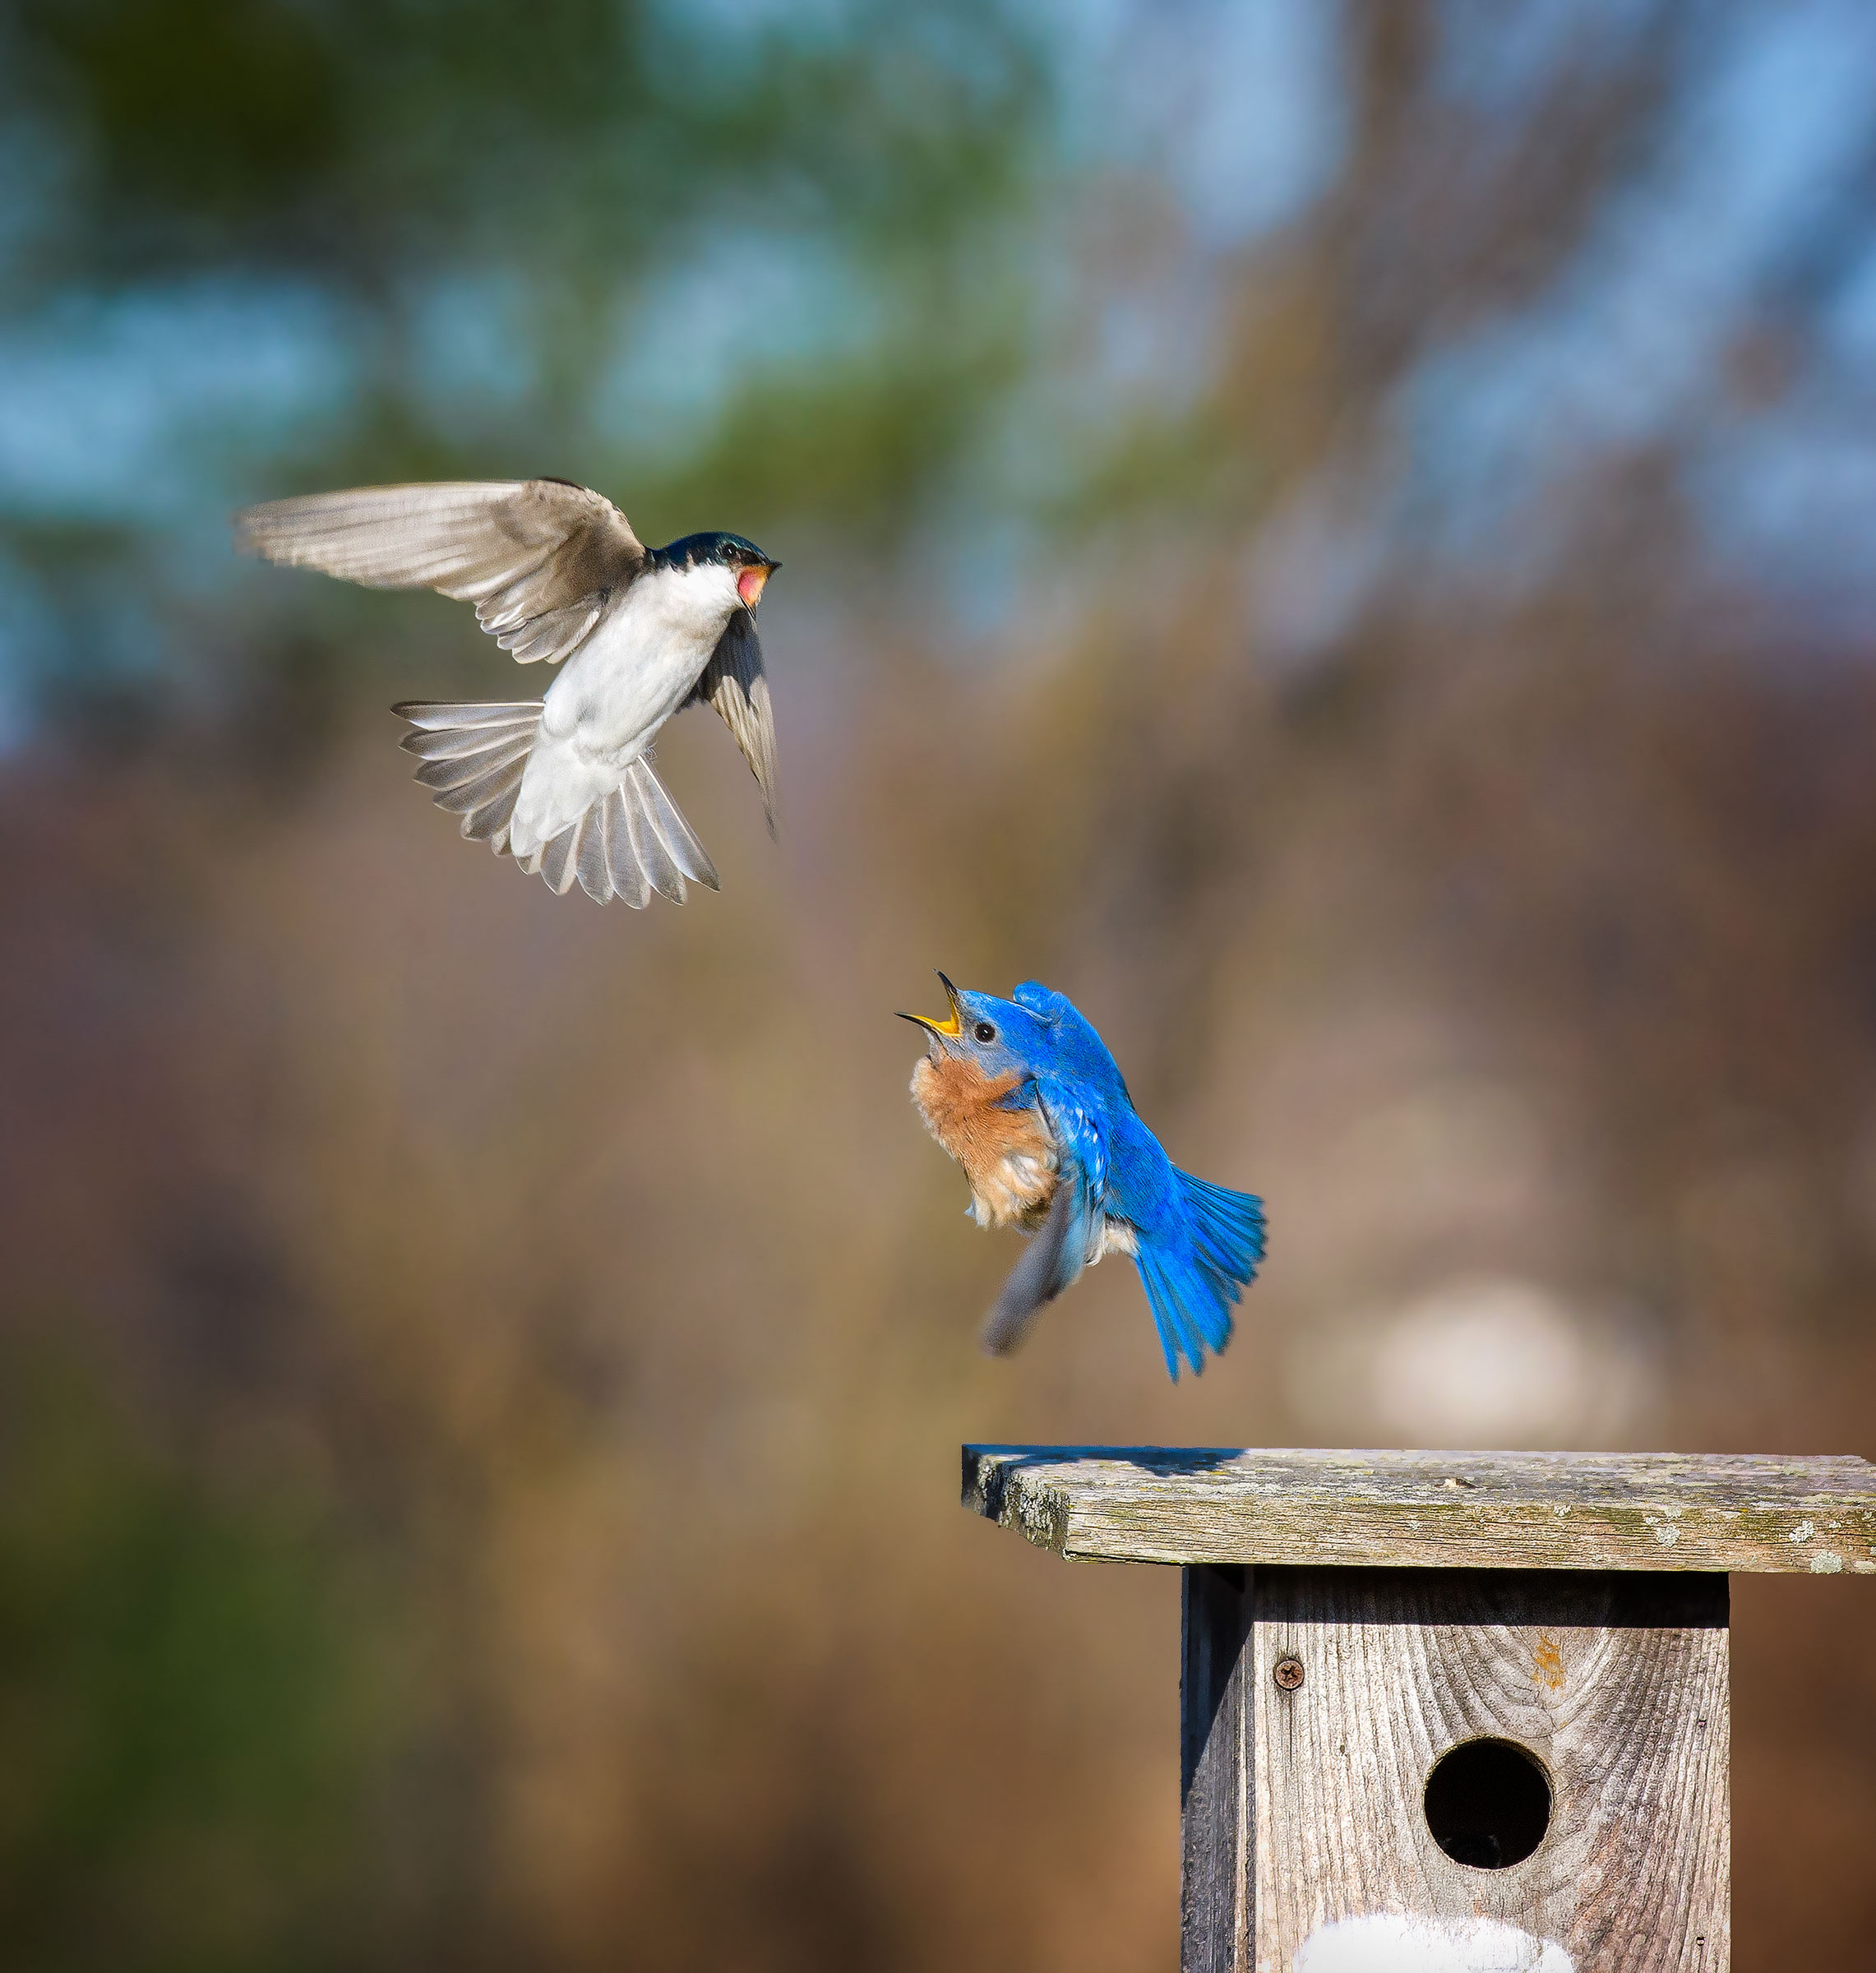 Tree Swallow and Eastern Bluebird. Vicki Jauron/Audubon Photography Awards